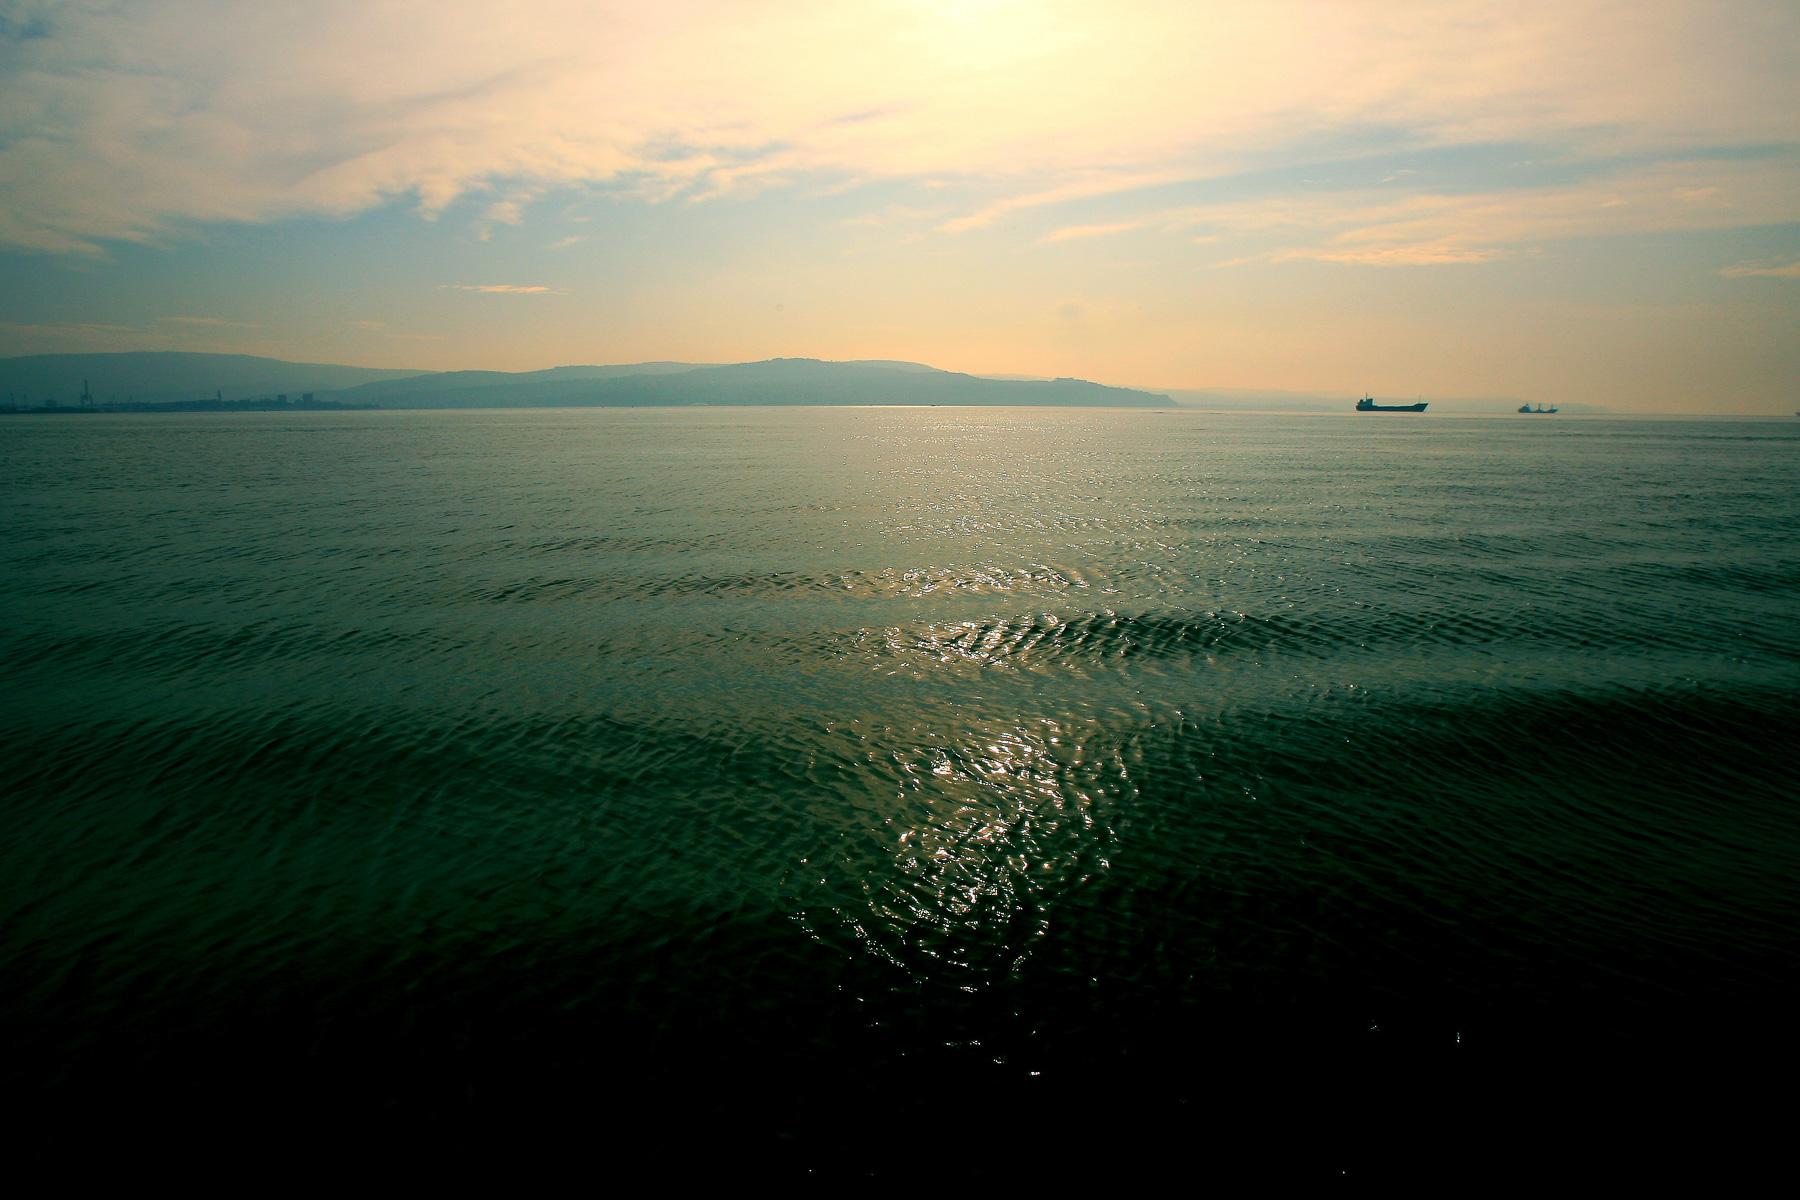 Koper Bay